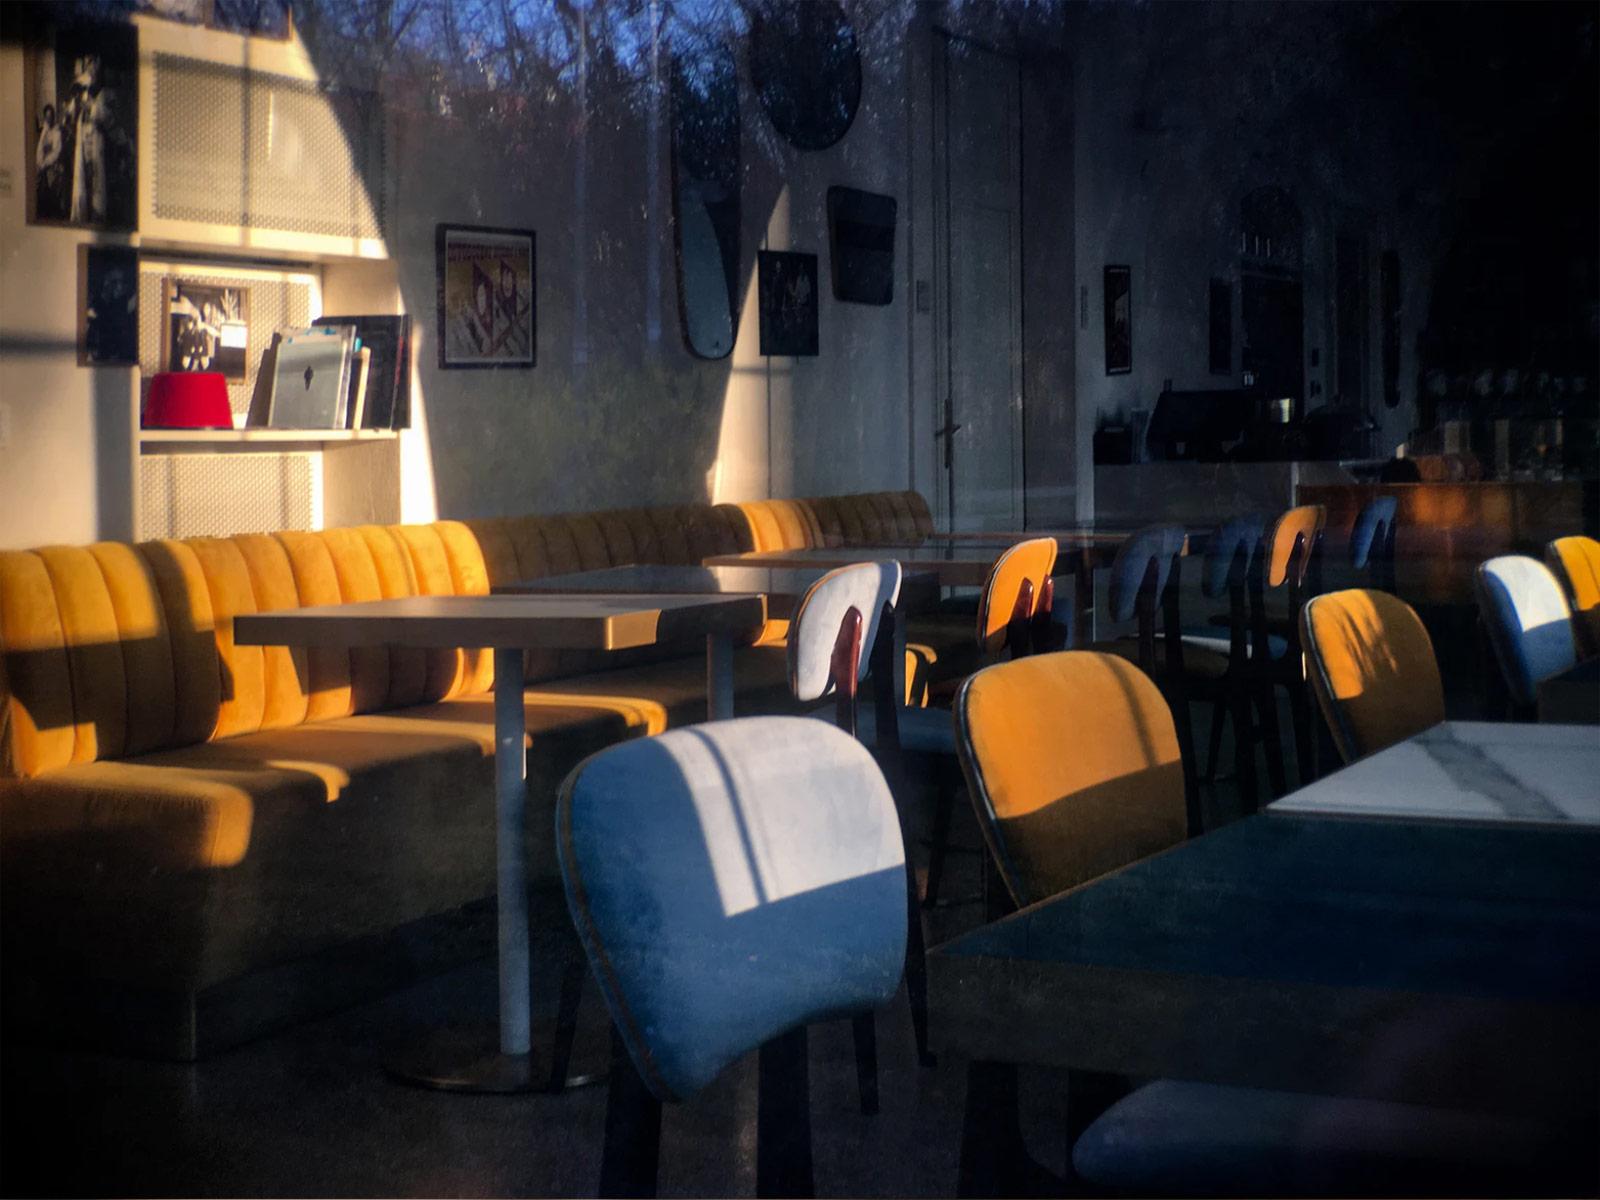 Restaurant & Retail POS System